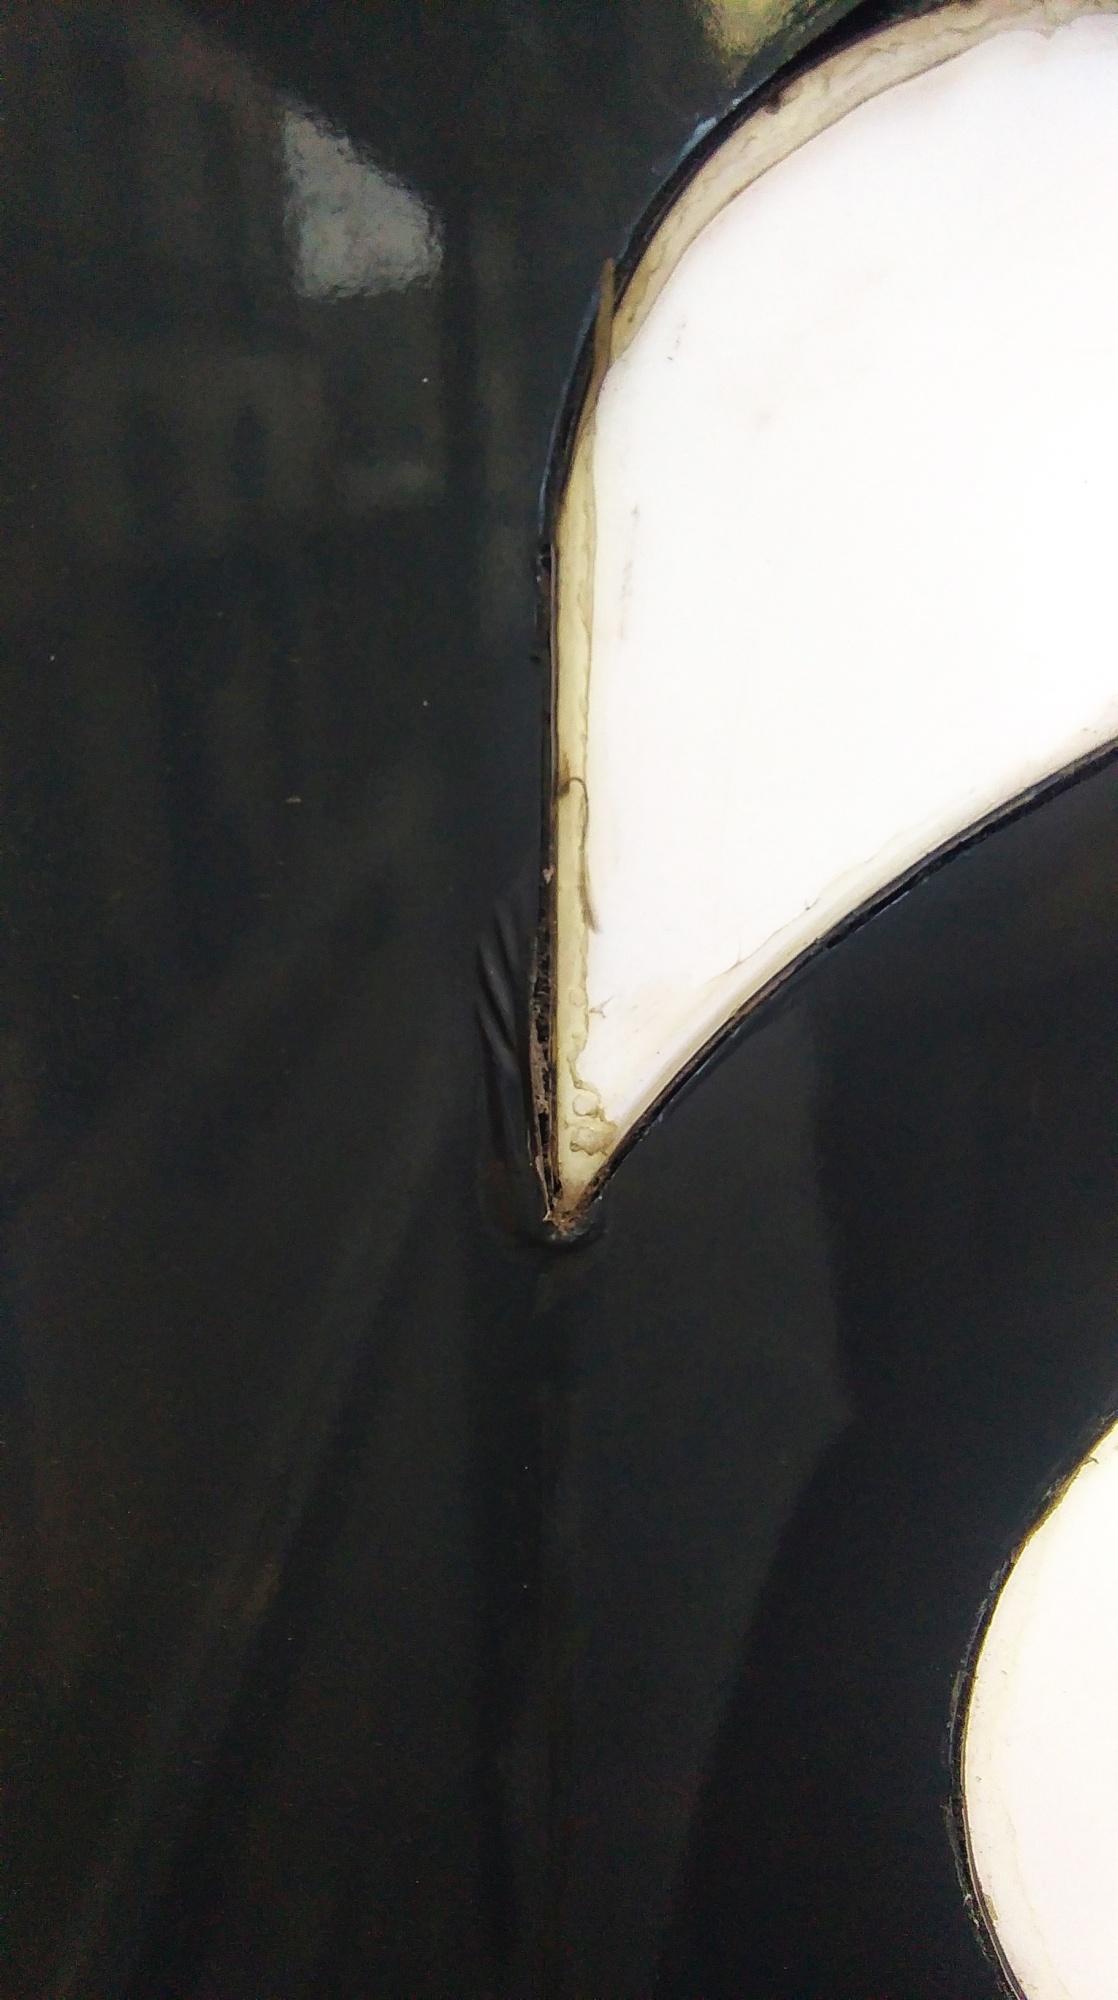 IMAG0104